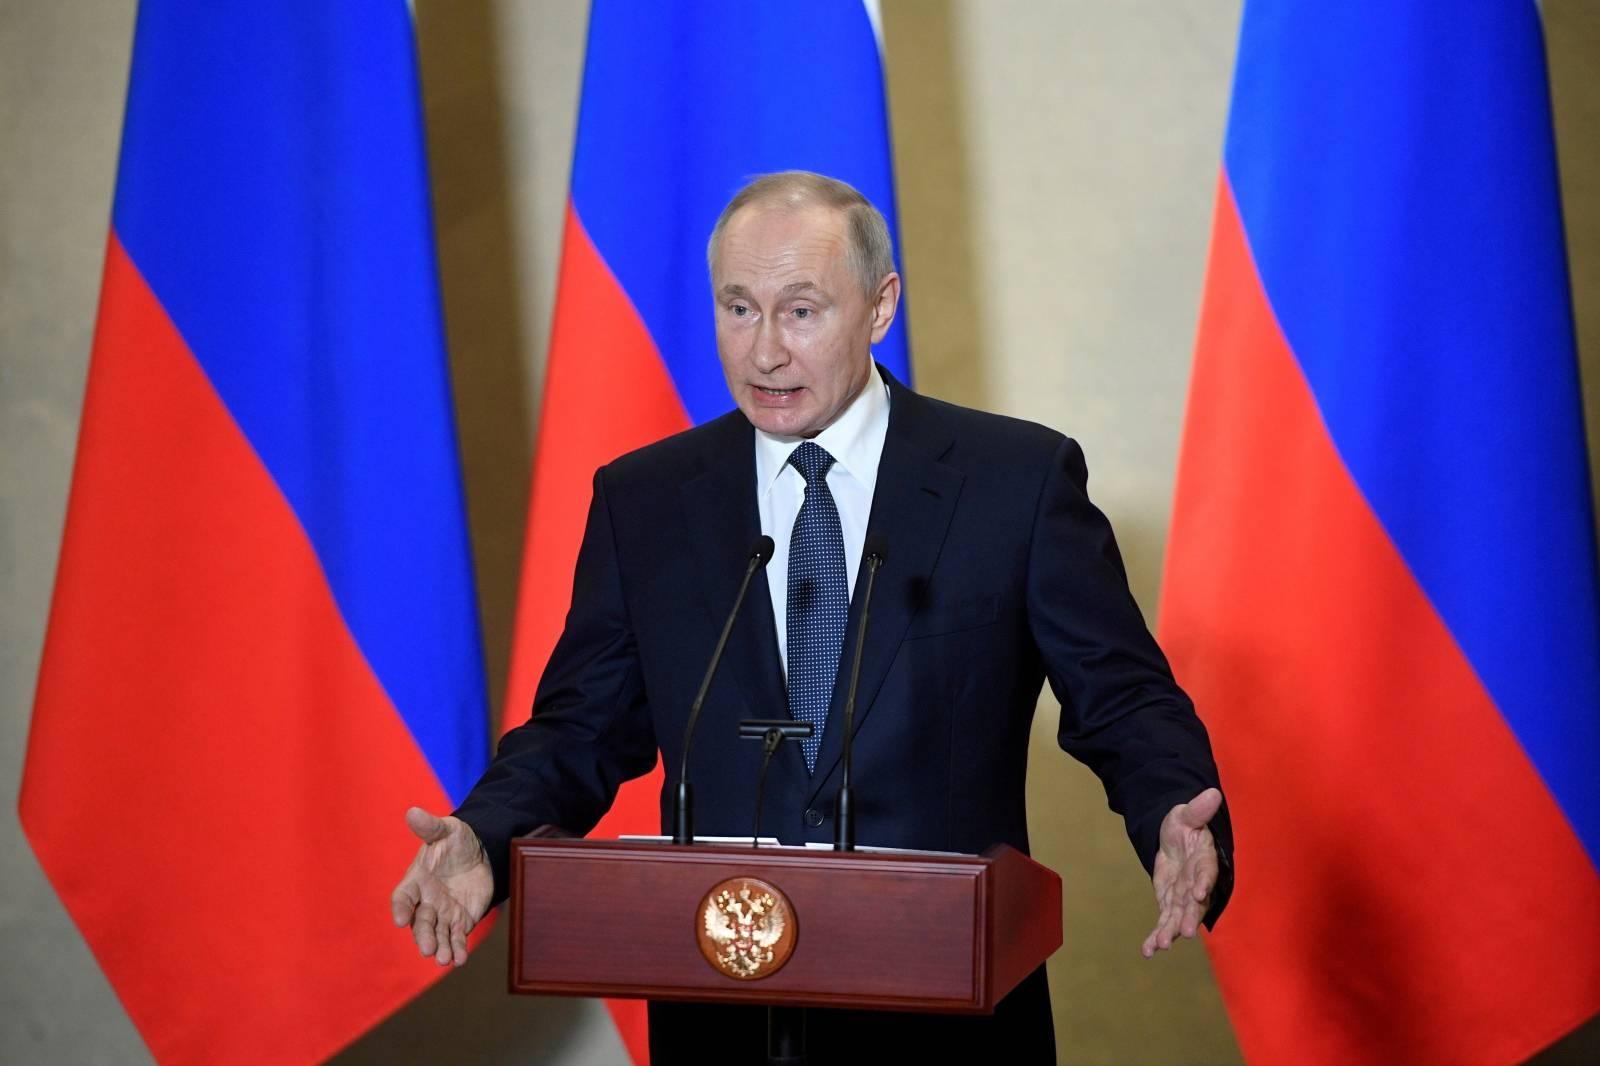 FILE PHOTO: Russian President Vladimir Putin attends an awarding ceremony in Sevastopol